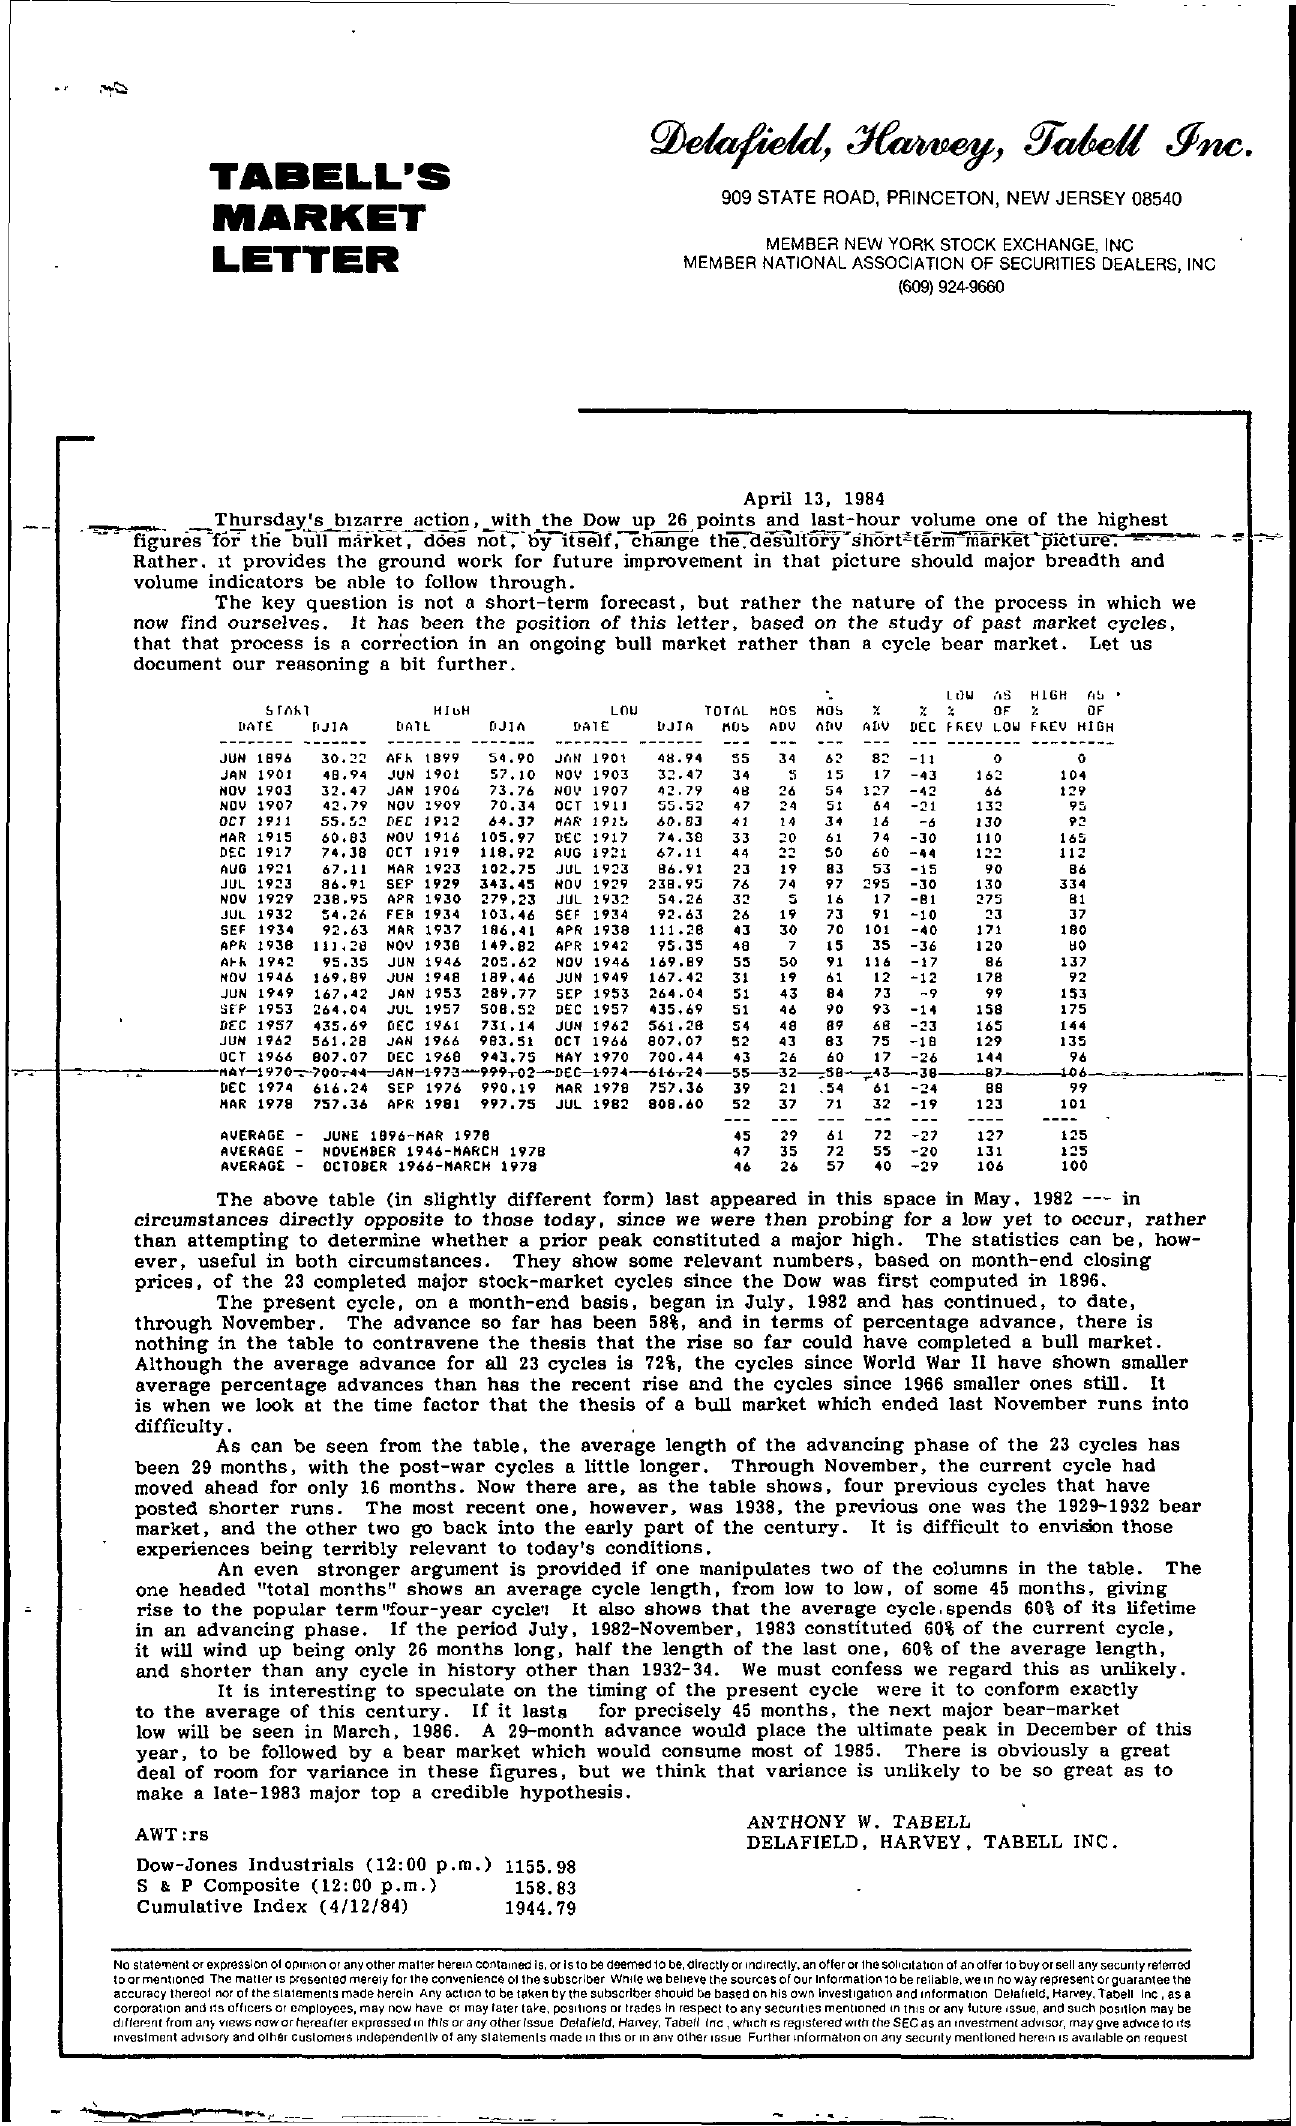 Tabell's Market Letter - April 13, 1984